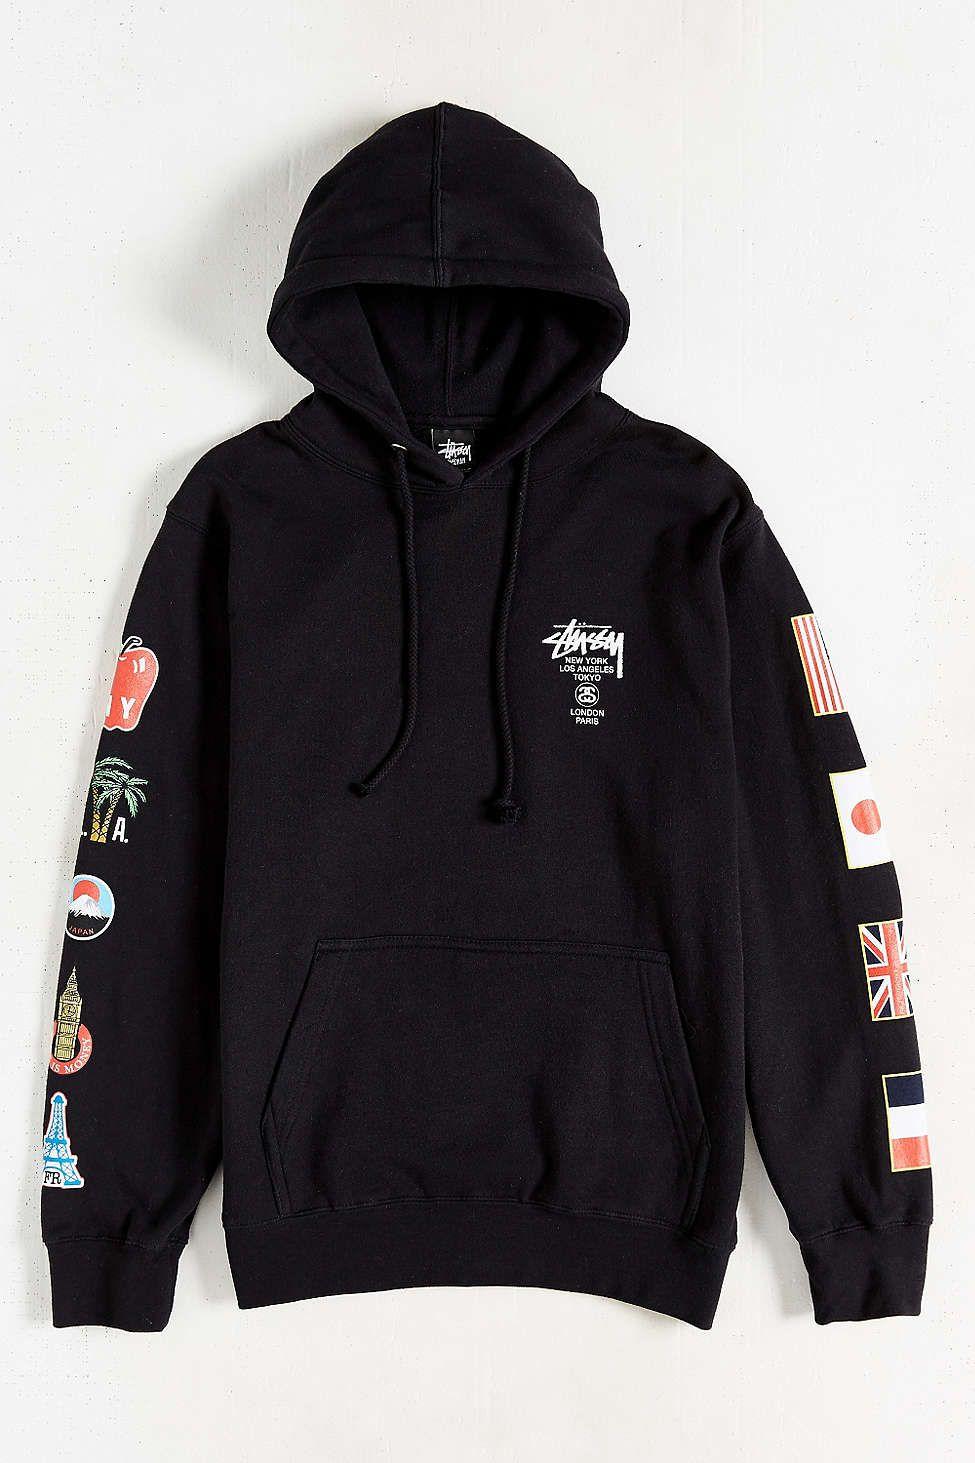 2fb2721c4607 Stussy World Tour Flags Pullover Hoodie Sweatshirt